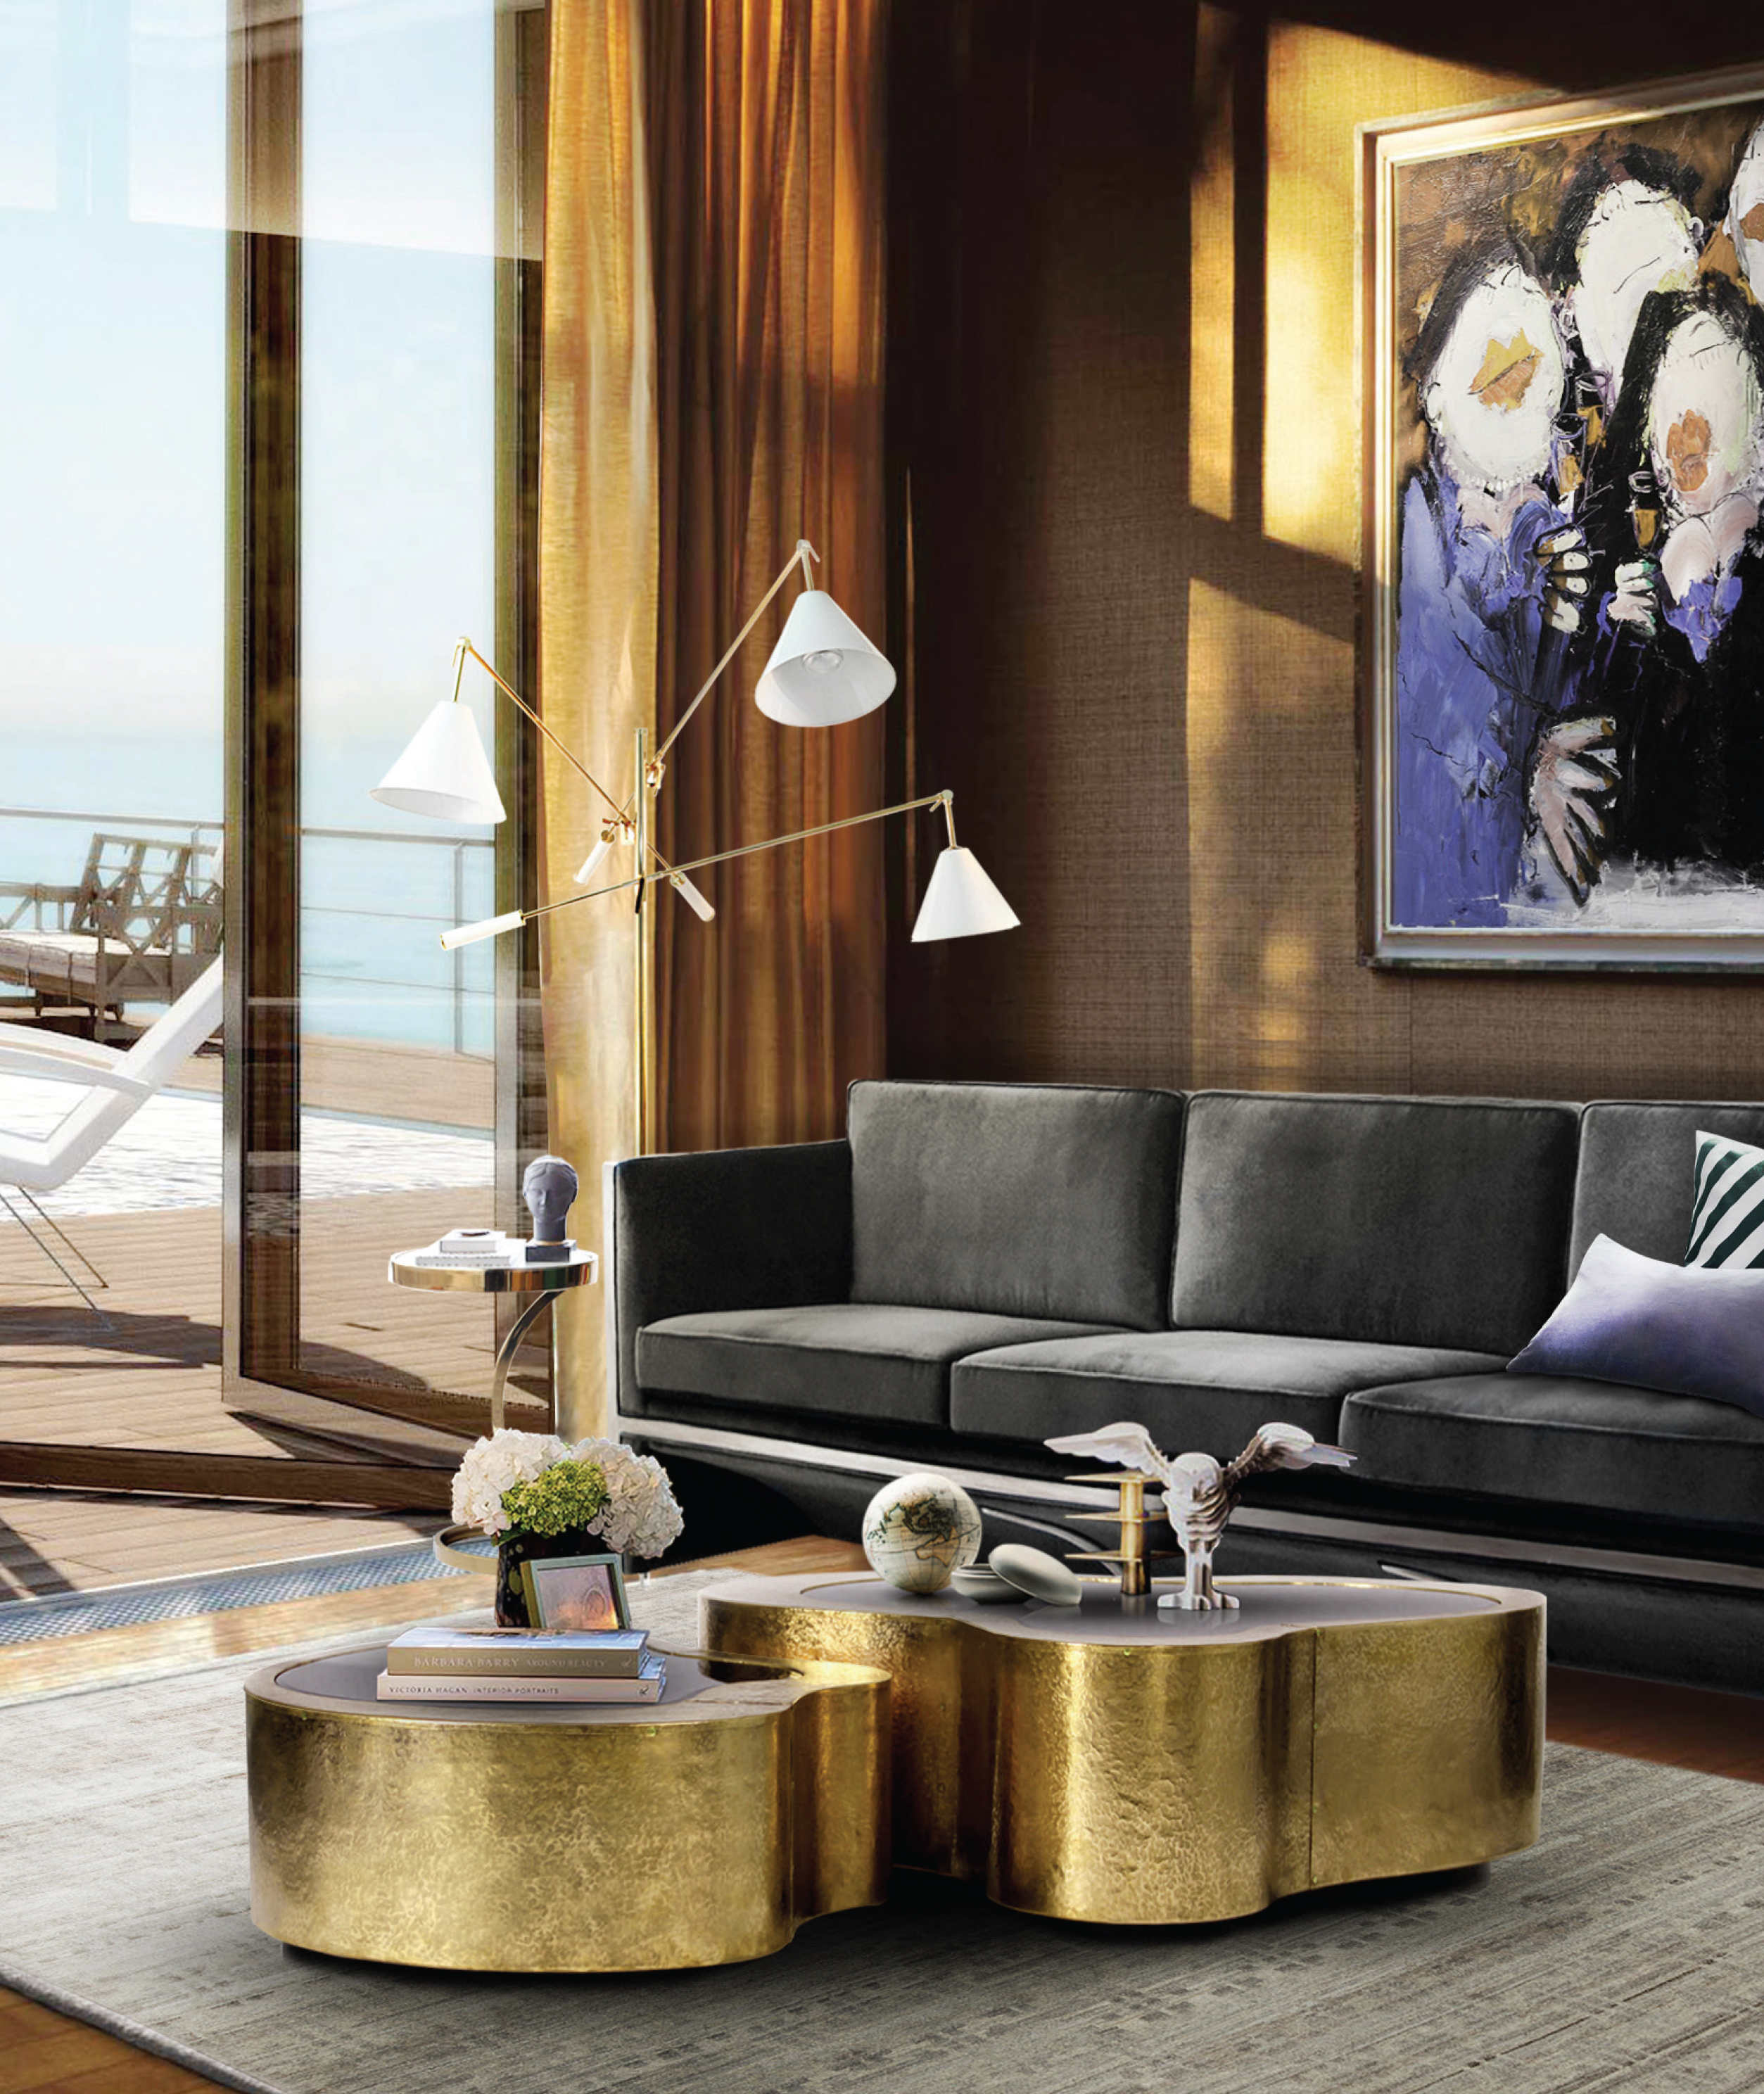 Living Room Decor Inspiration: DESIGN INSPIRATION FOR THE LUXURIOUS MODERN-CLASSIC LIVING